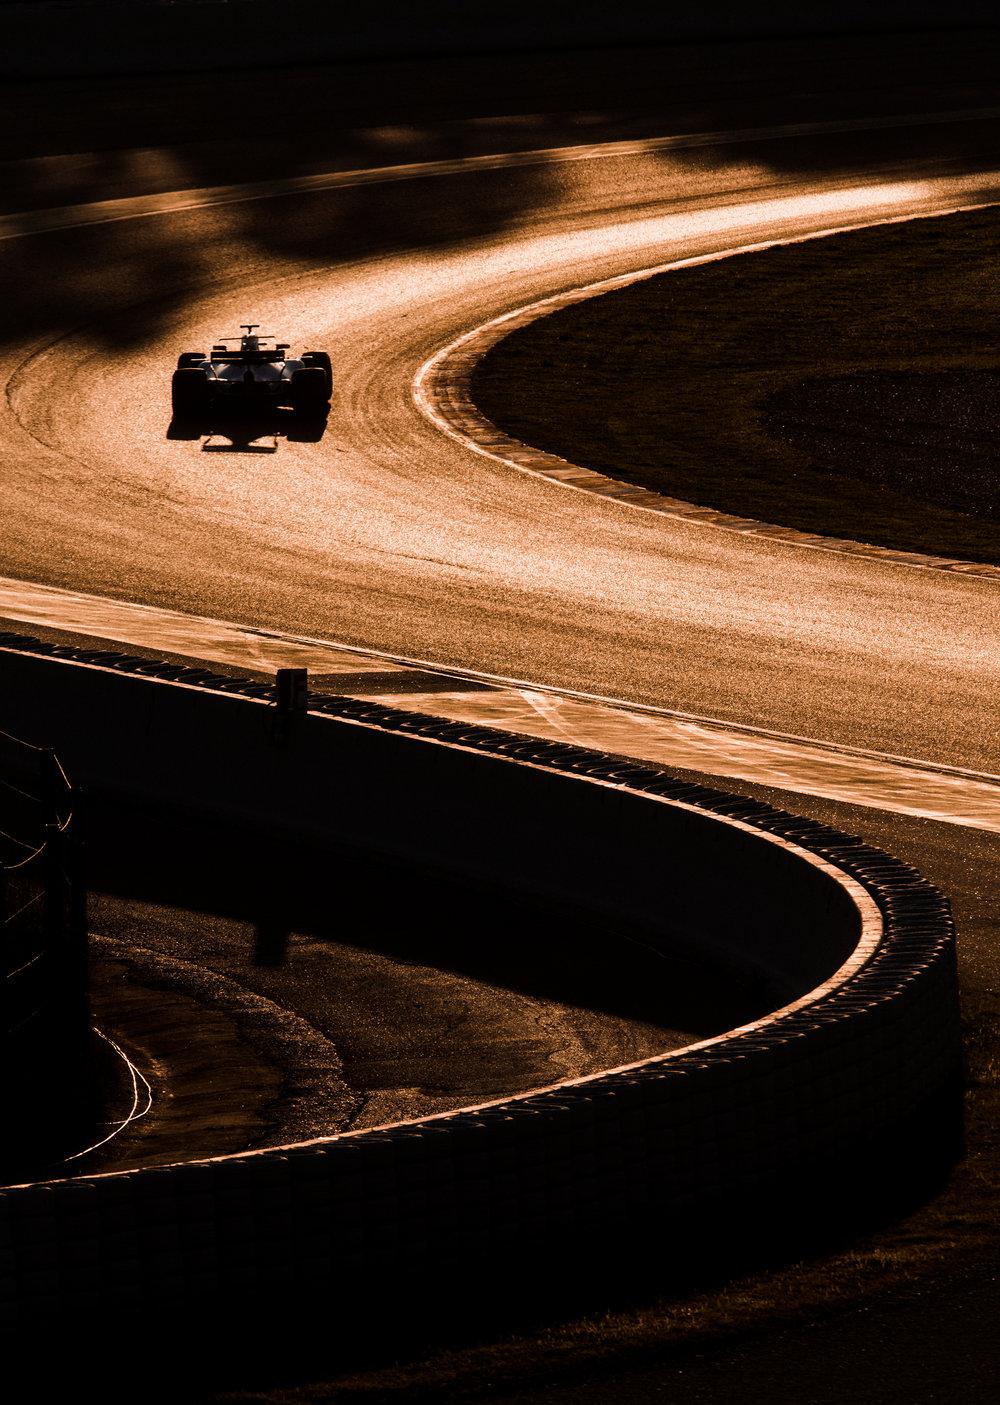 Winter Testing. 2017 FIA Formula 1 Championship, Barcelona, Spain.